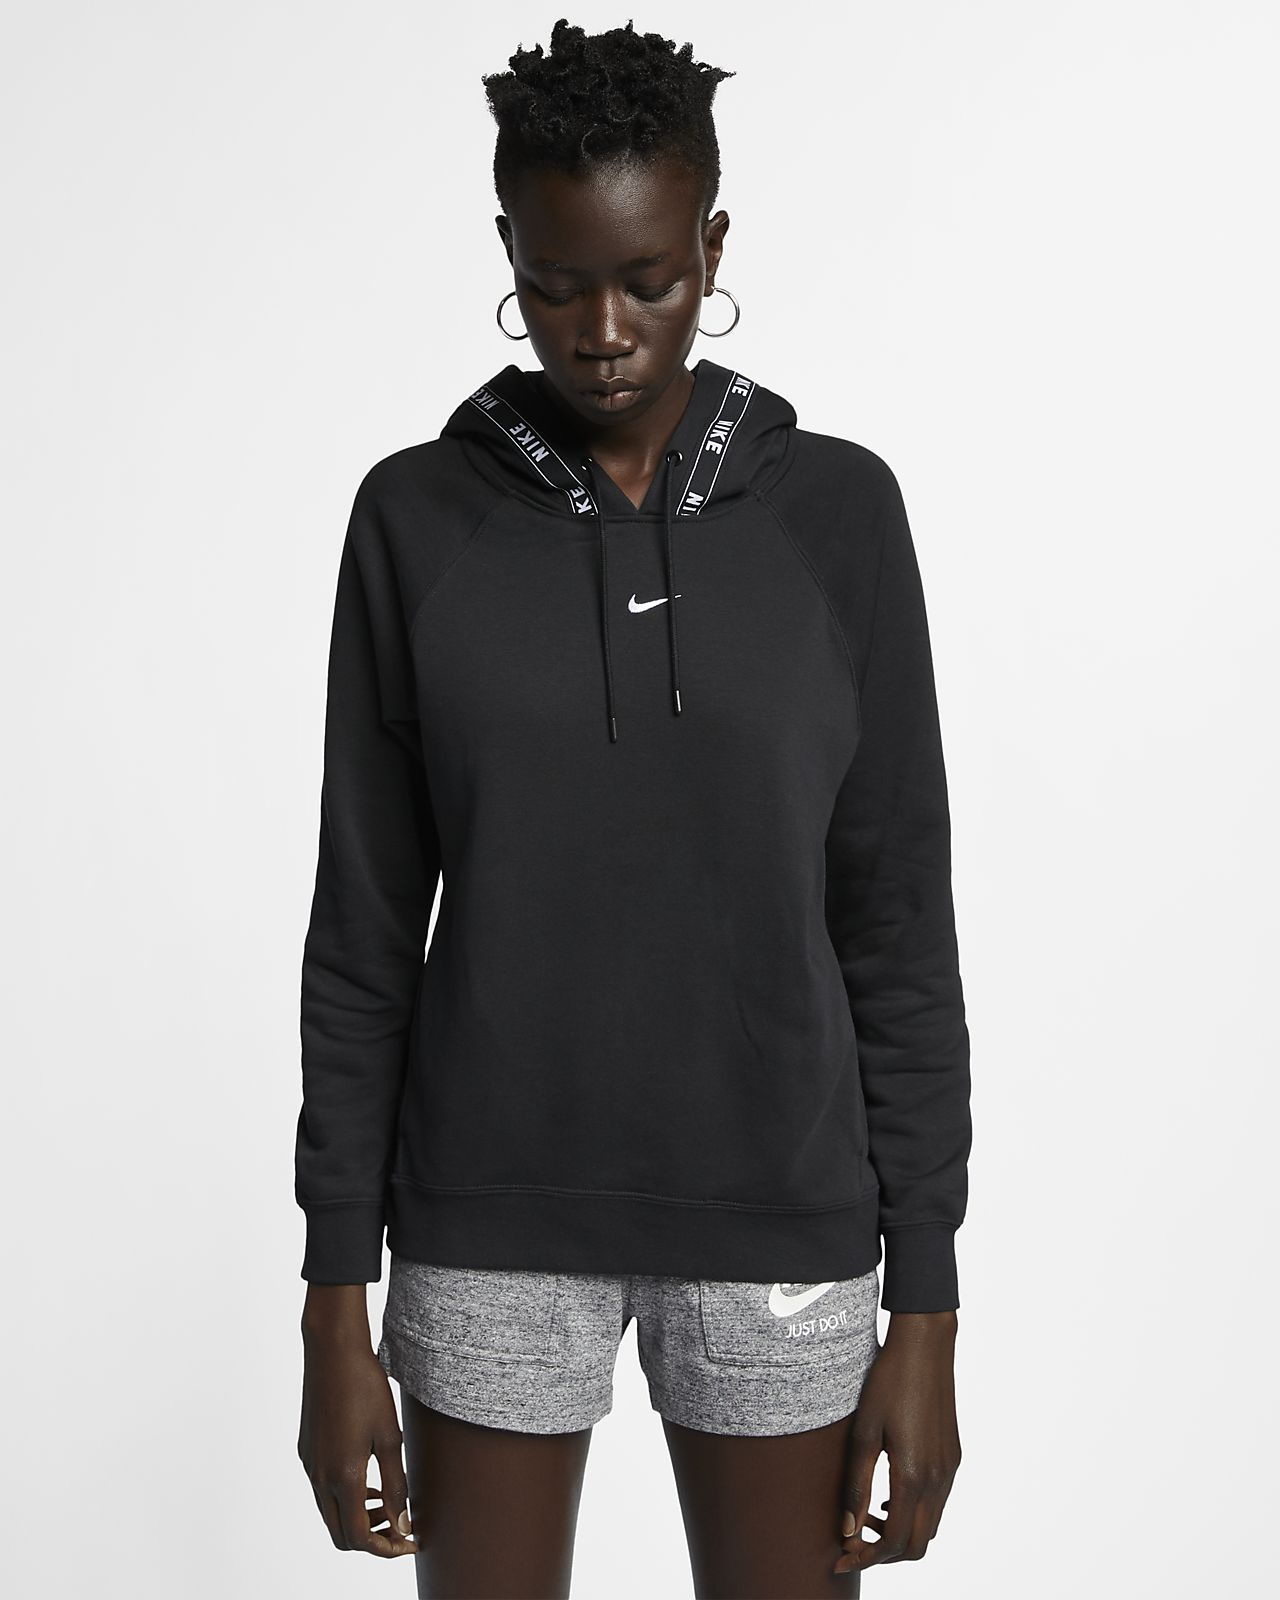 01626f62e5f9d5 Nike Sportswear Damen-Hoodie mit Logo. Nike.com LU